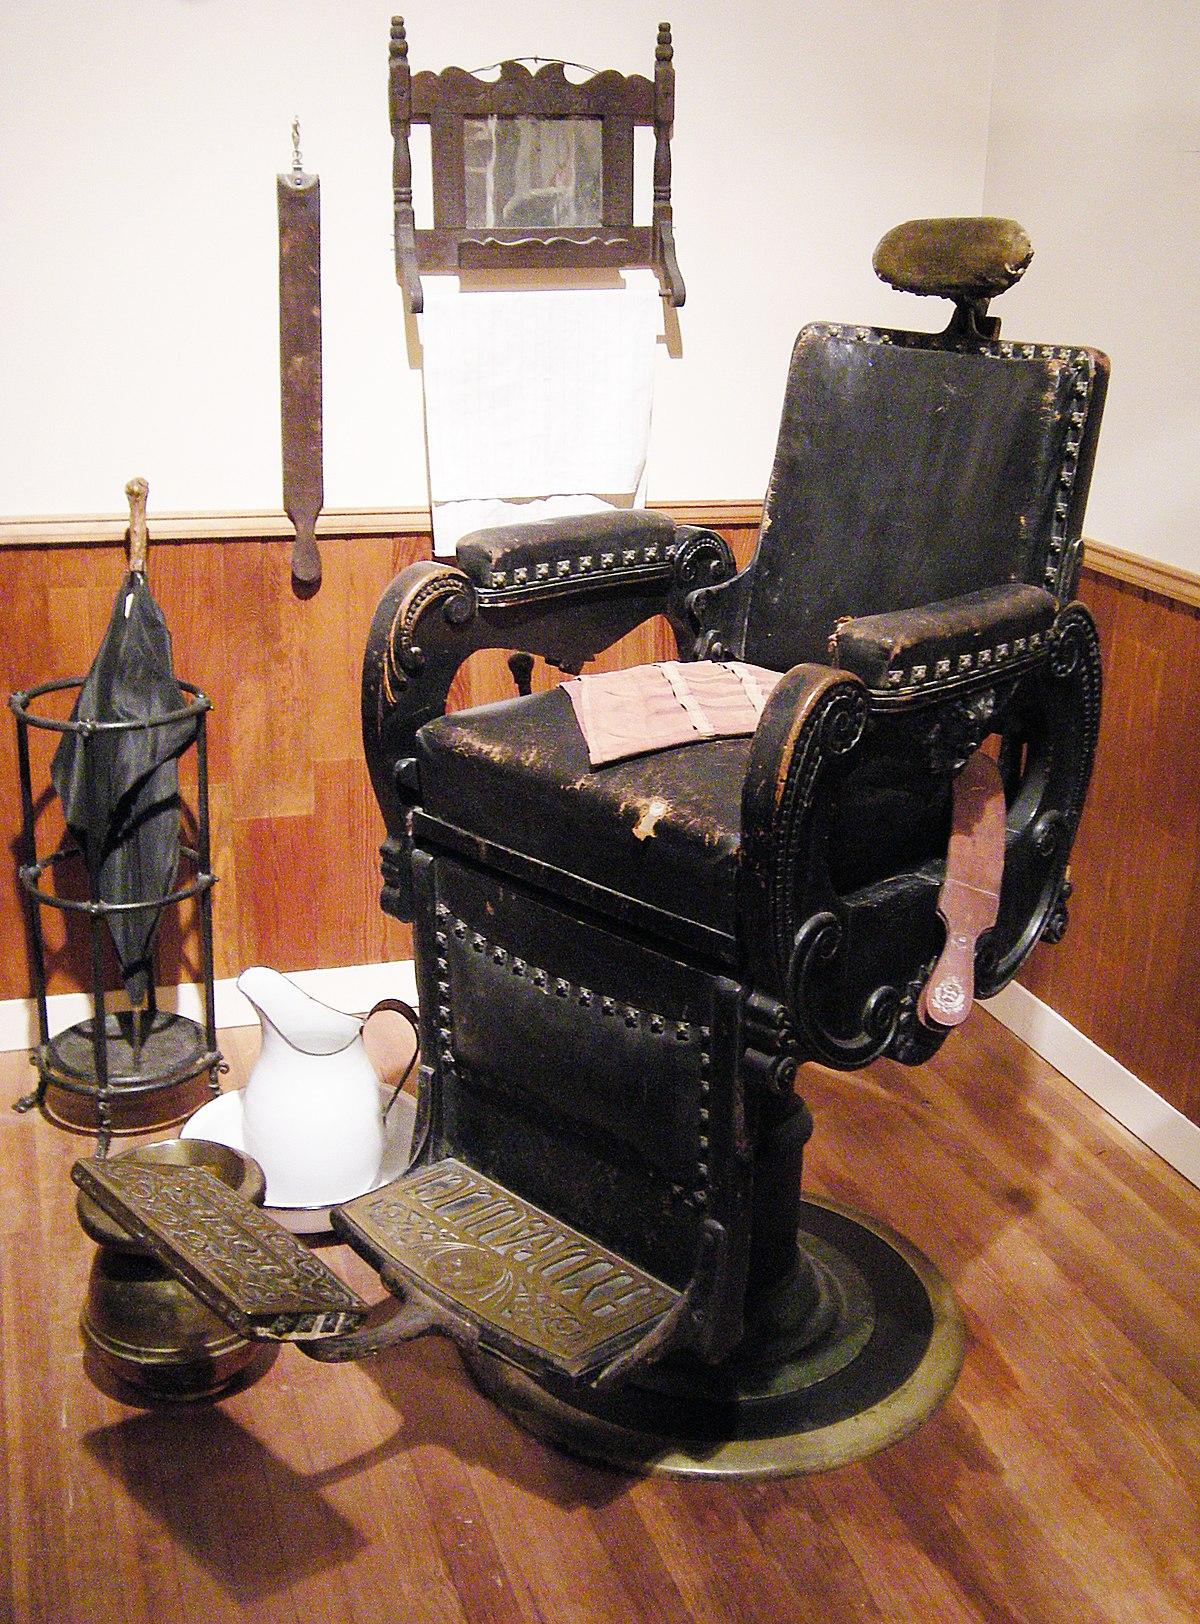 antique koken rare style barber chairs indoor oak shop congress for chair rhpinterestcom old